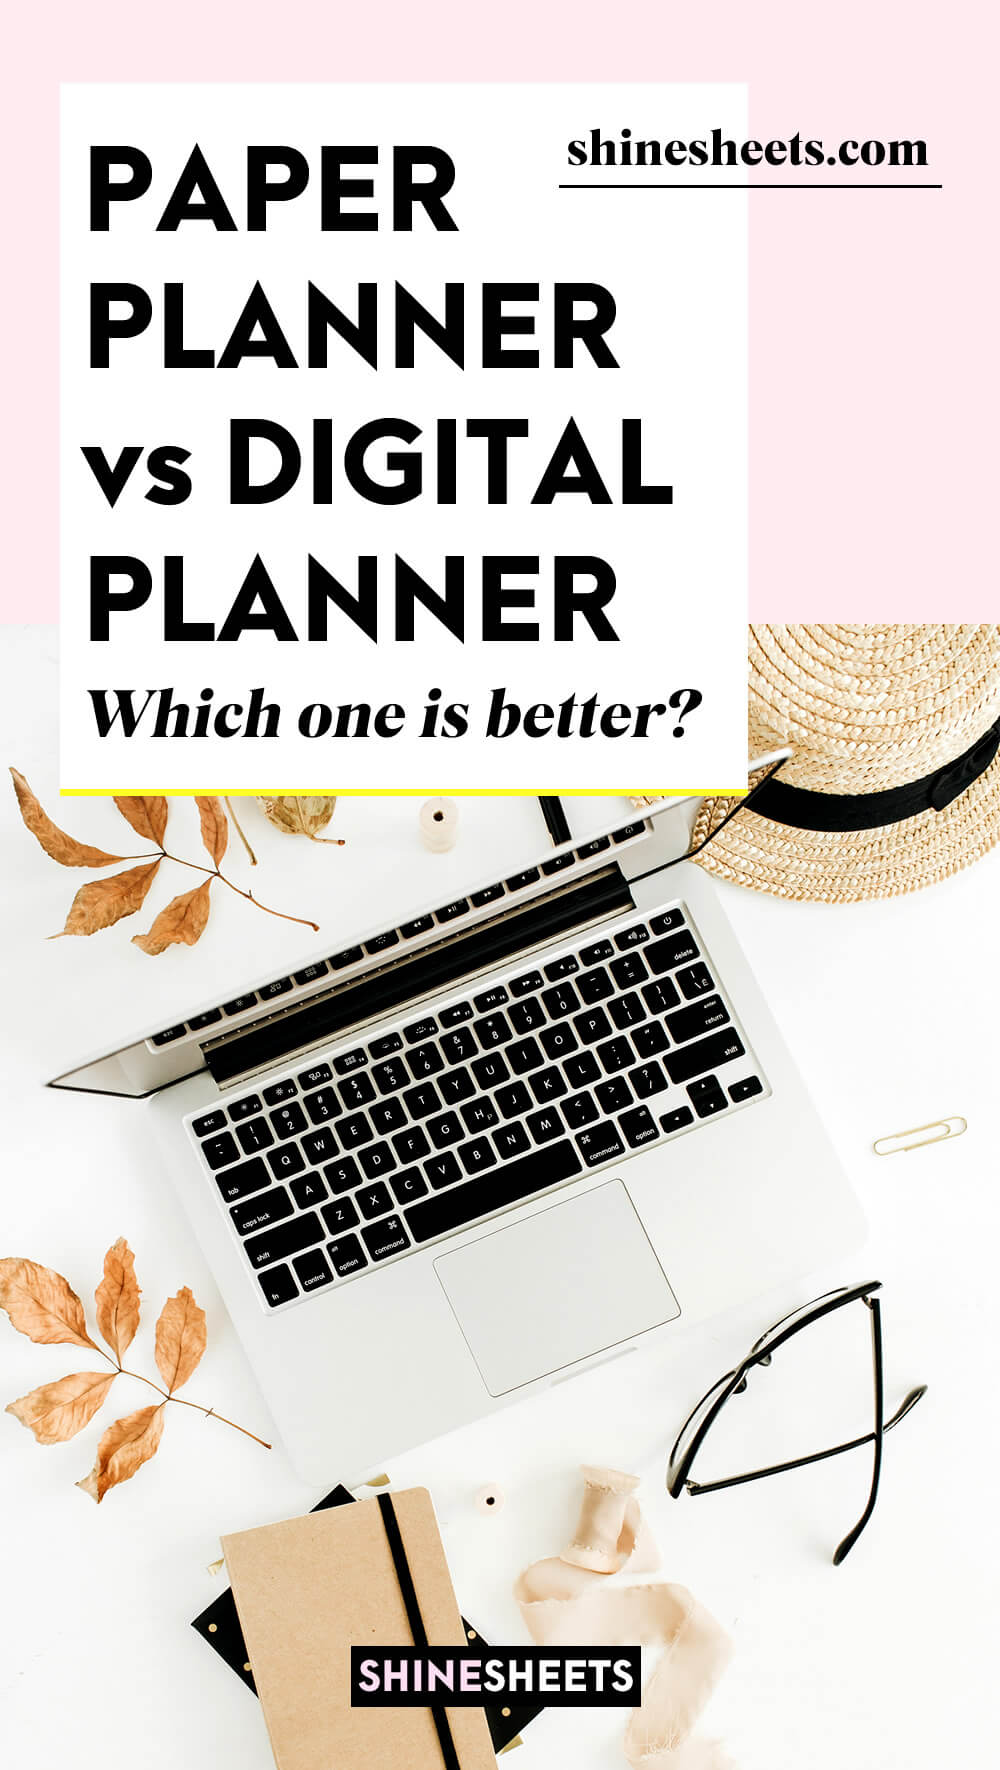 paper planner vs digital planner illustration